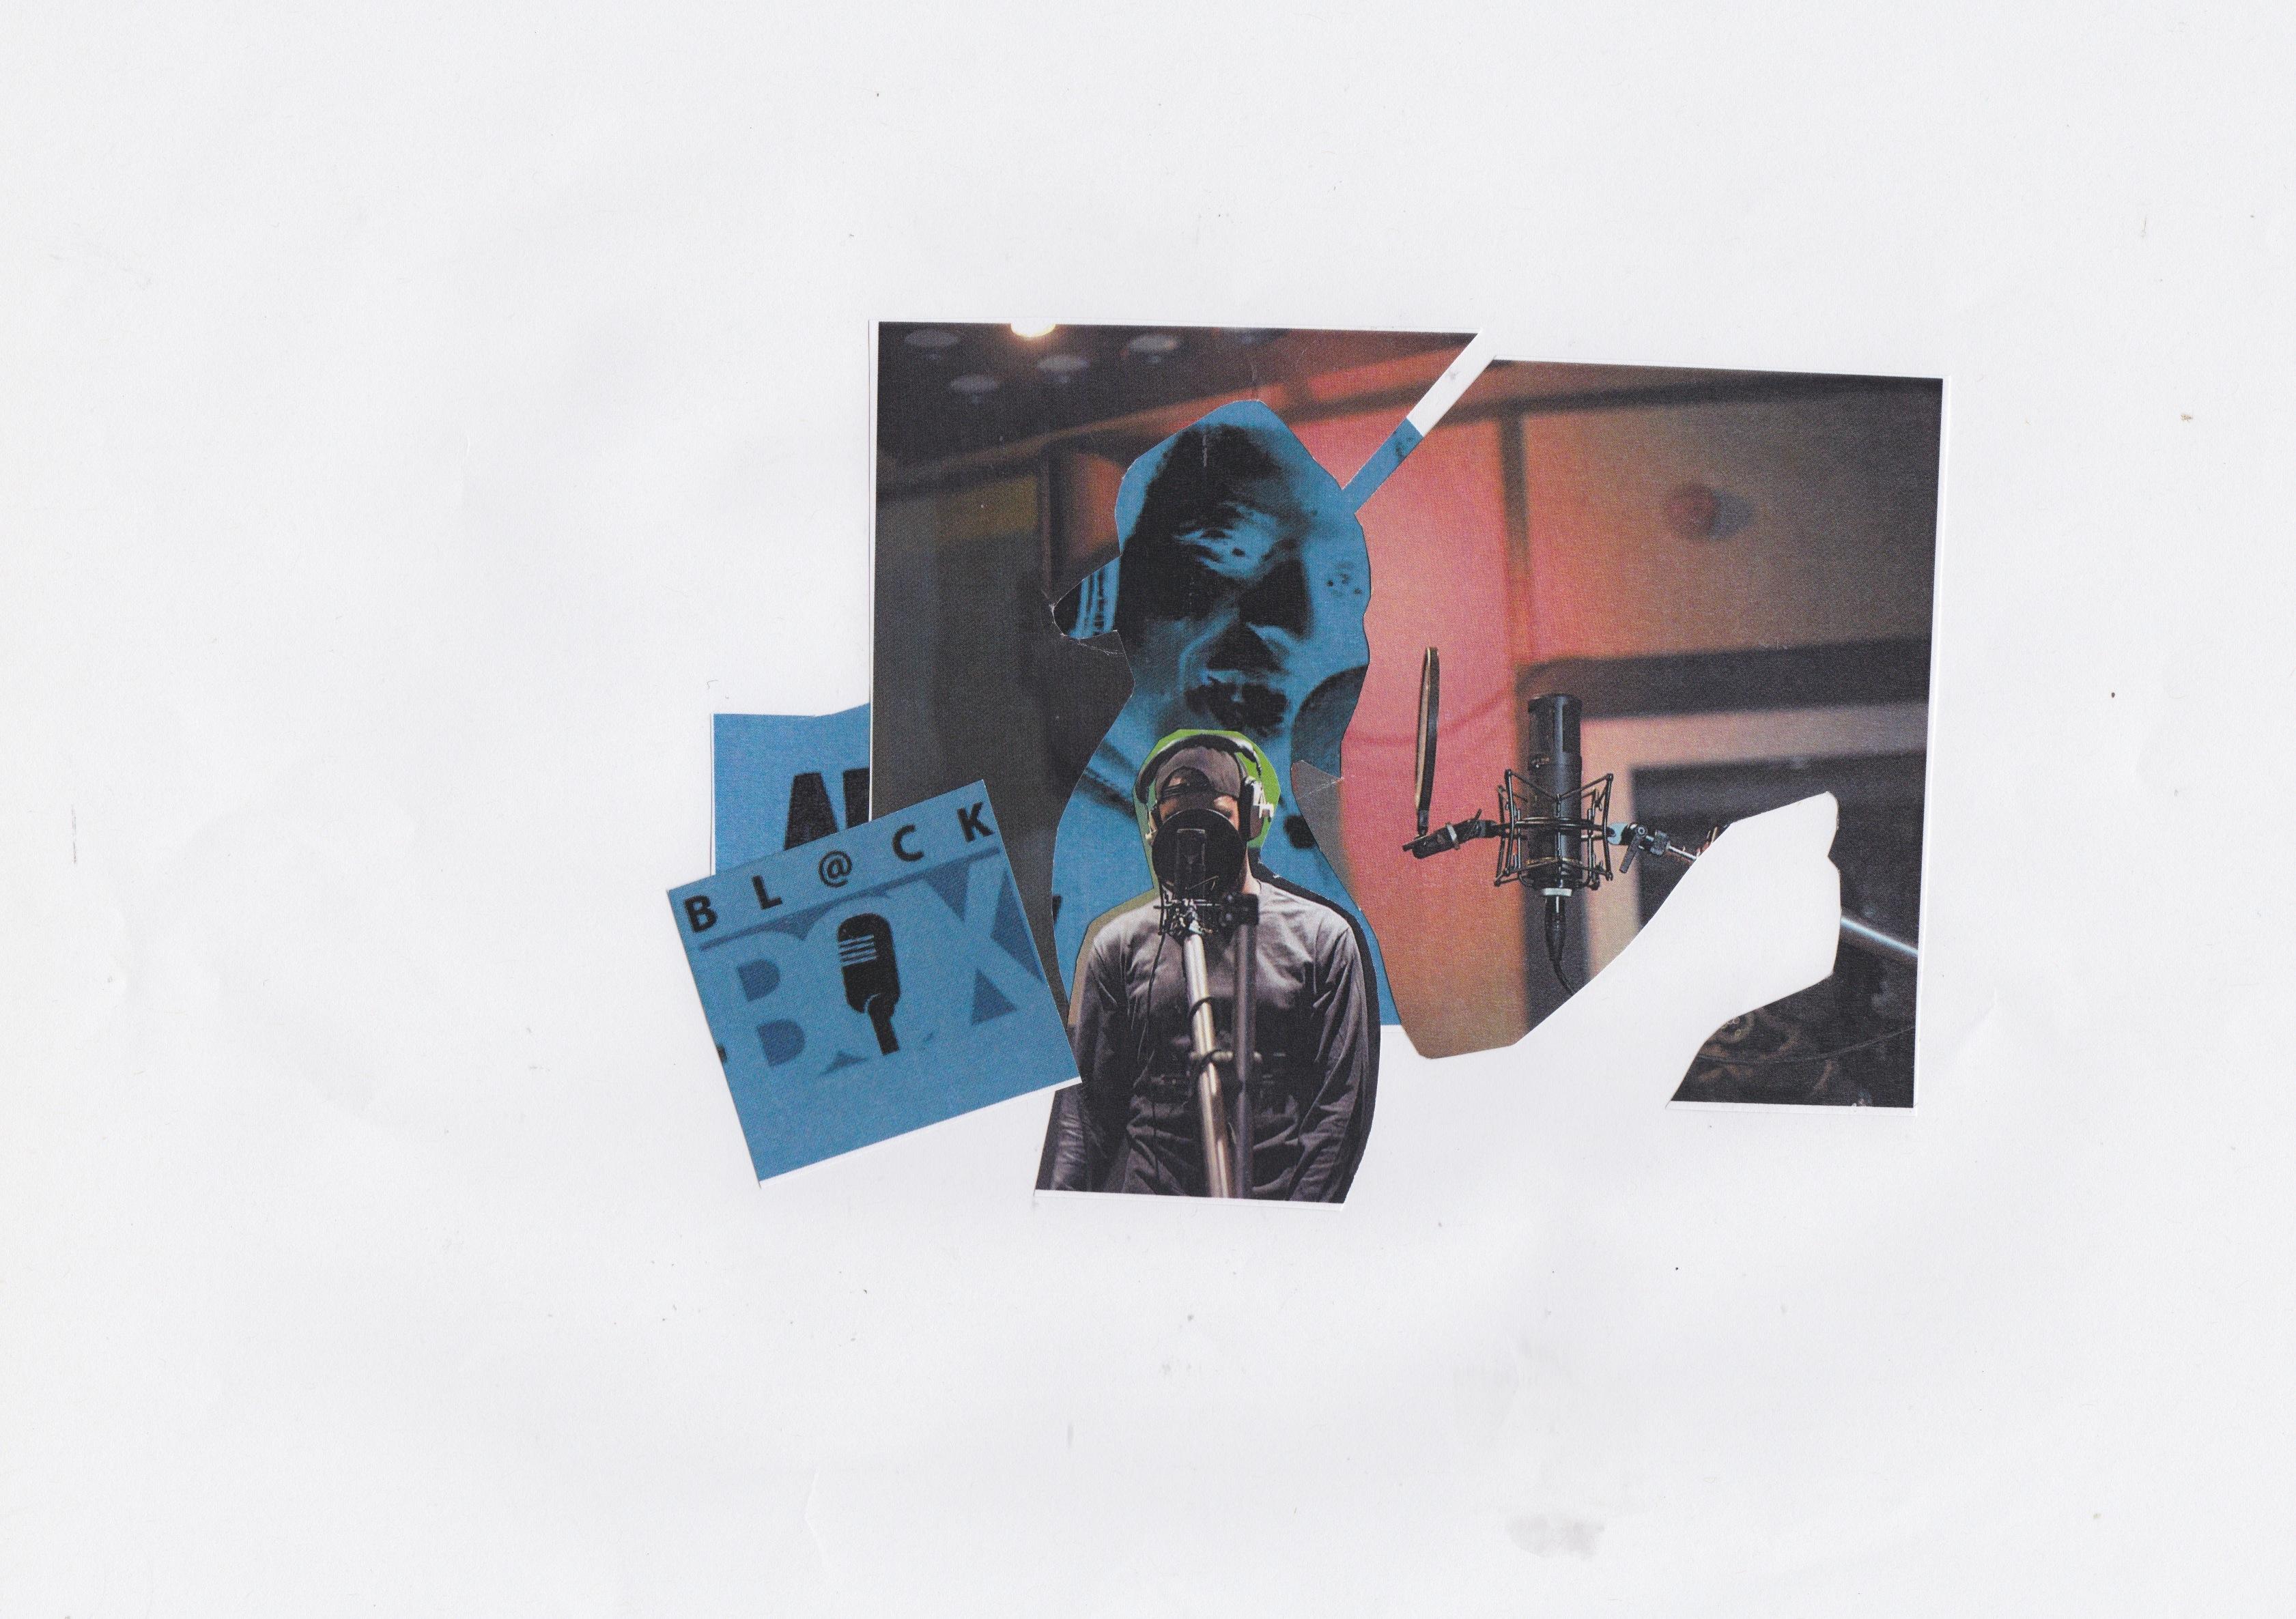 Blackbox collage 6